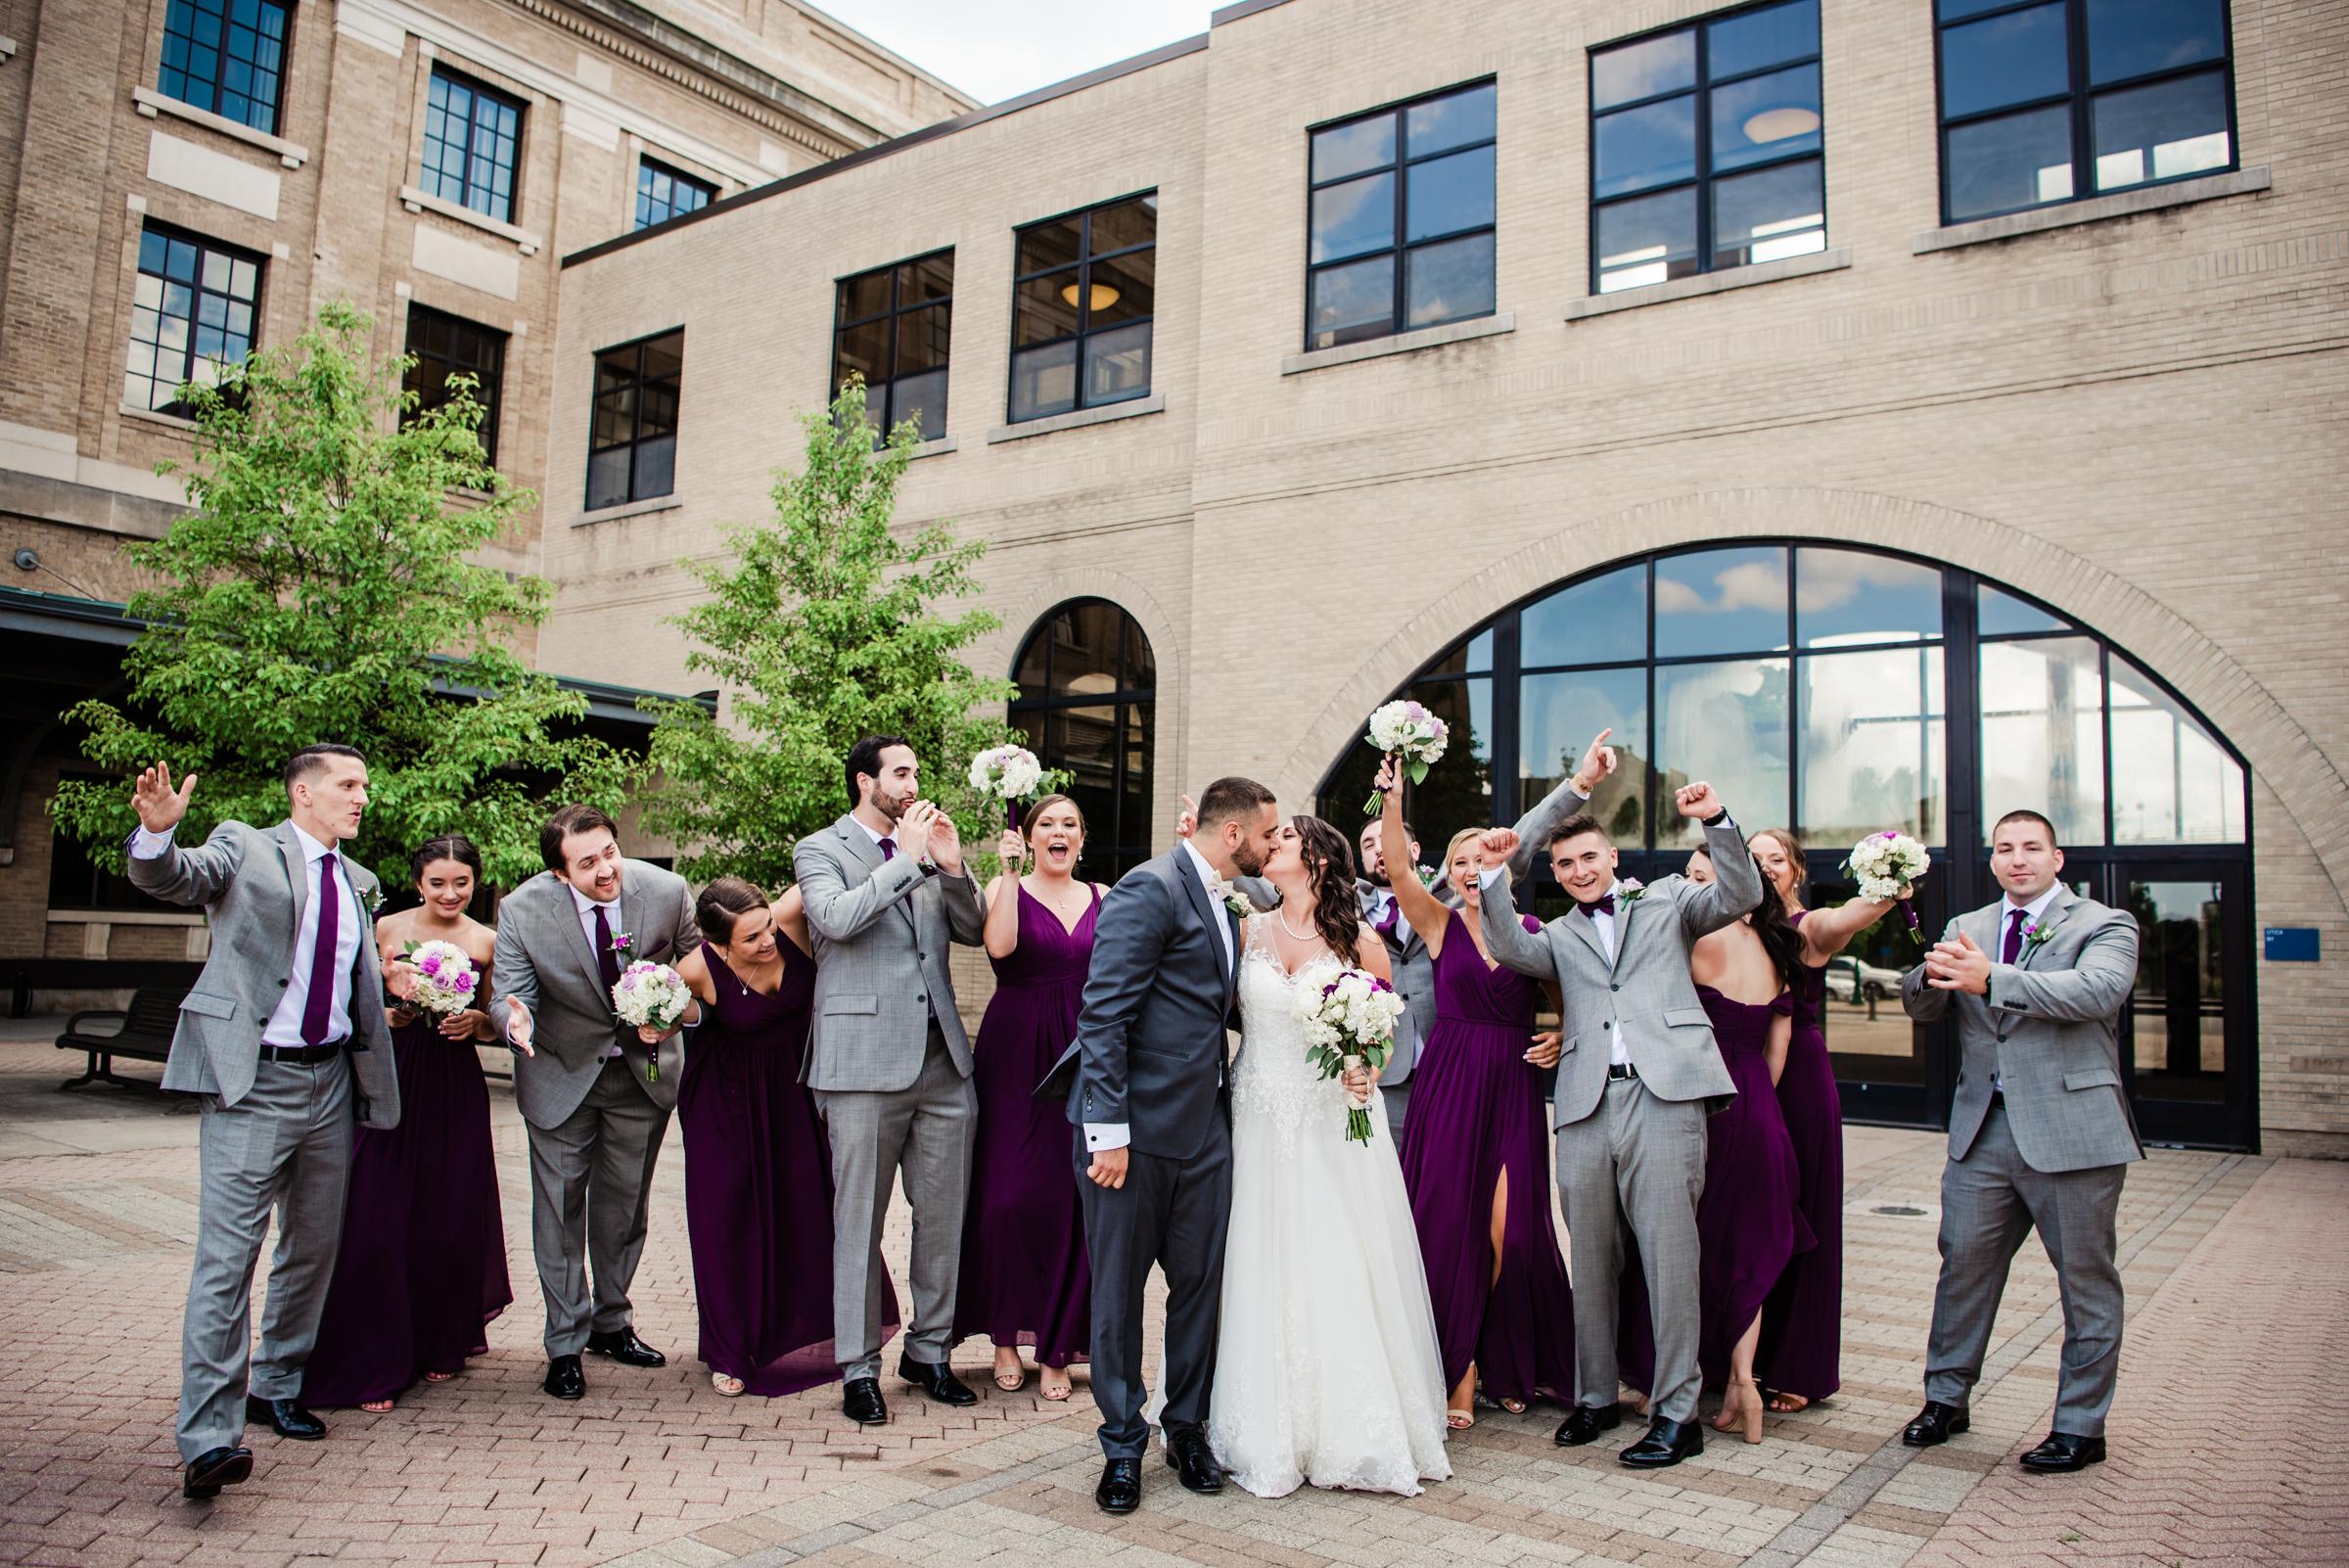 Historic_Old_St_Johns_Church_Valentinos_Banquet_Hall_Central_NY_Wedding_JILL_STUDIO_Rochester_NY_Photographer_DSC_6306.jpg